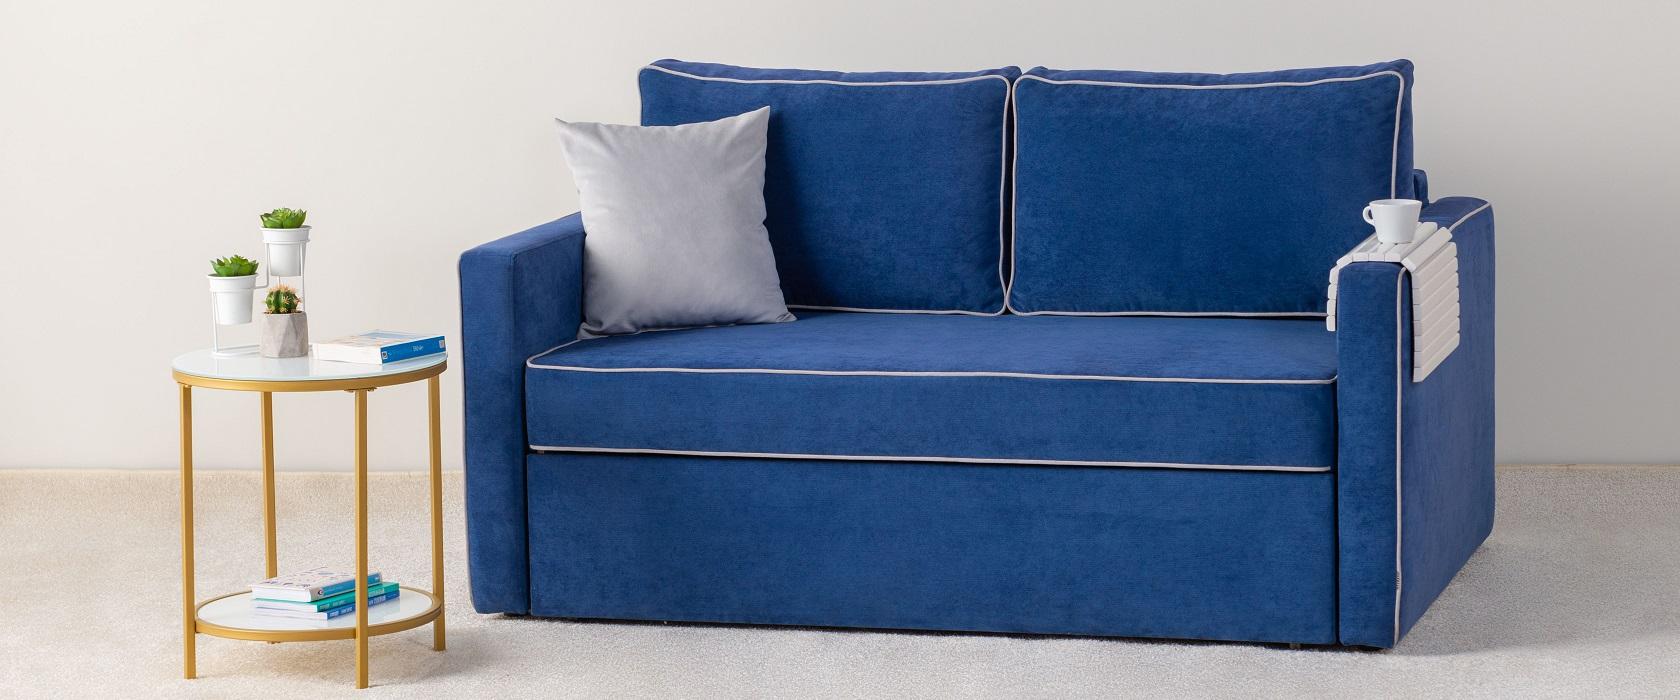 Двухместный диван Mattone - Фото 2 - Pufetto